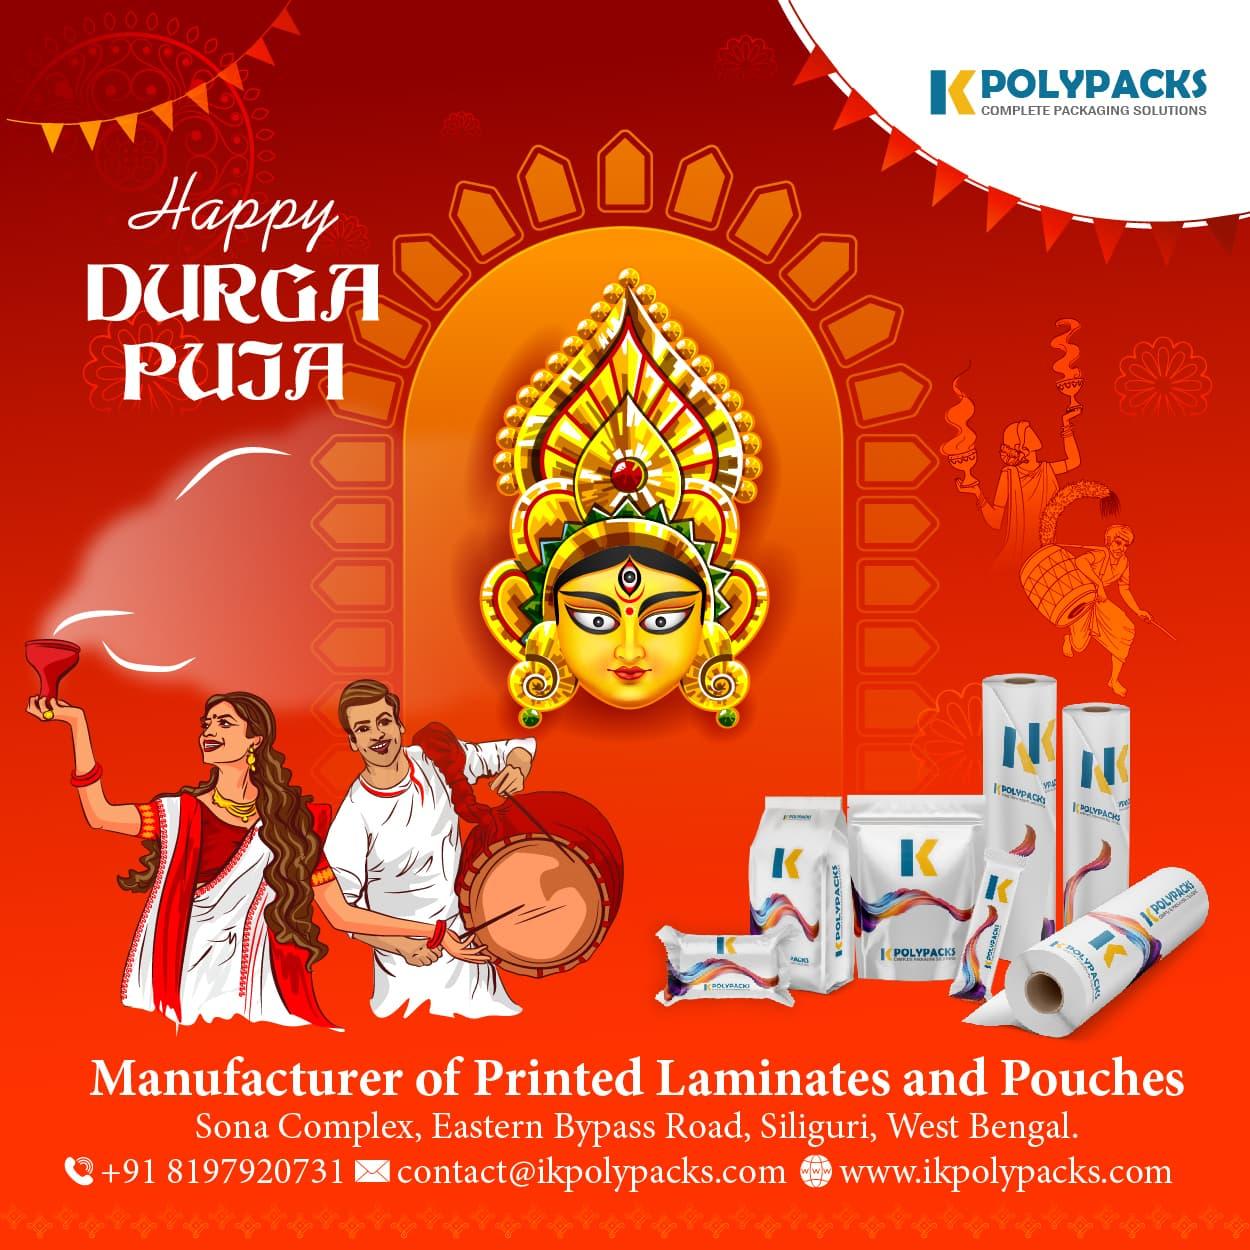 Durga puja 01 - Season Greetings 500